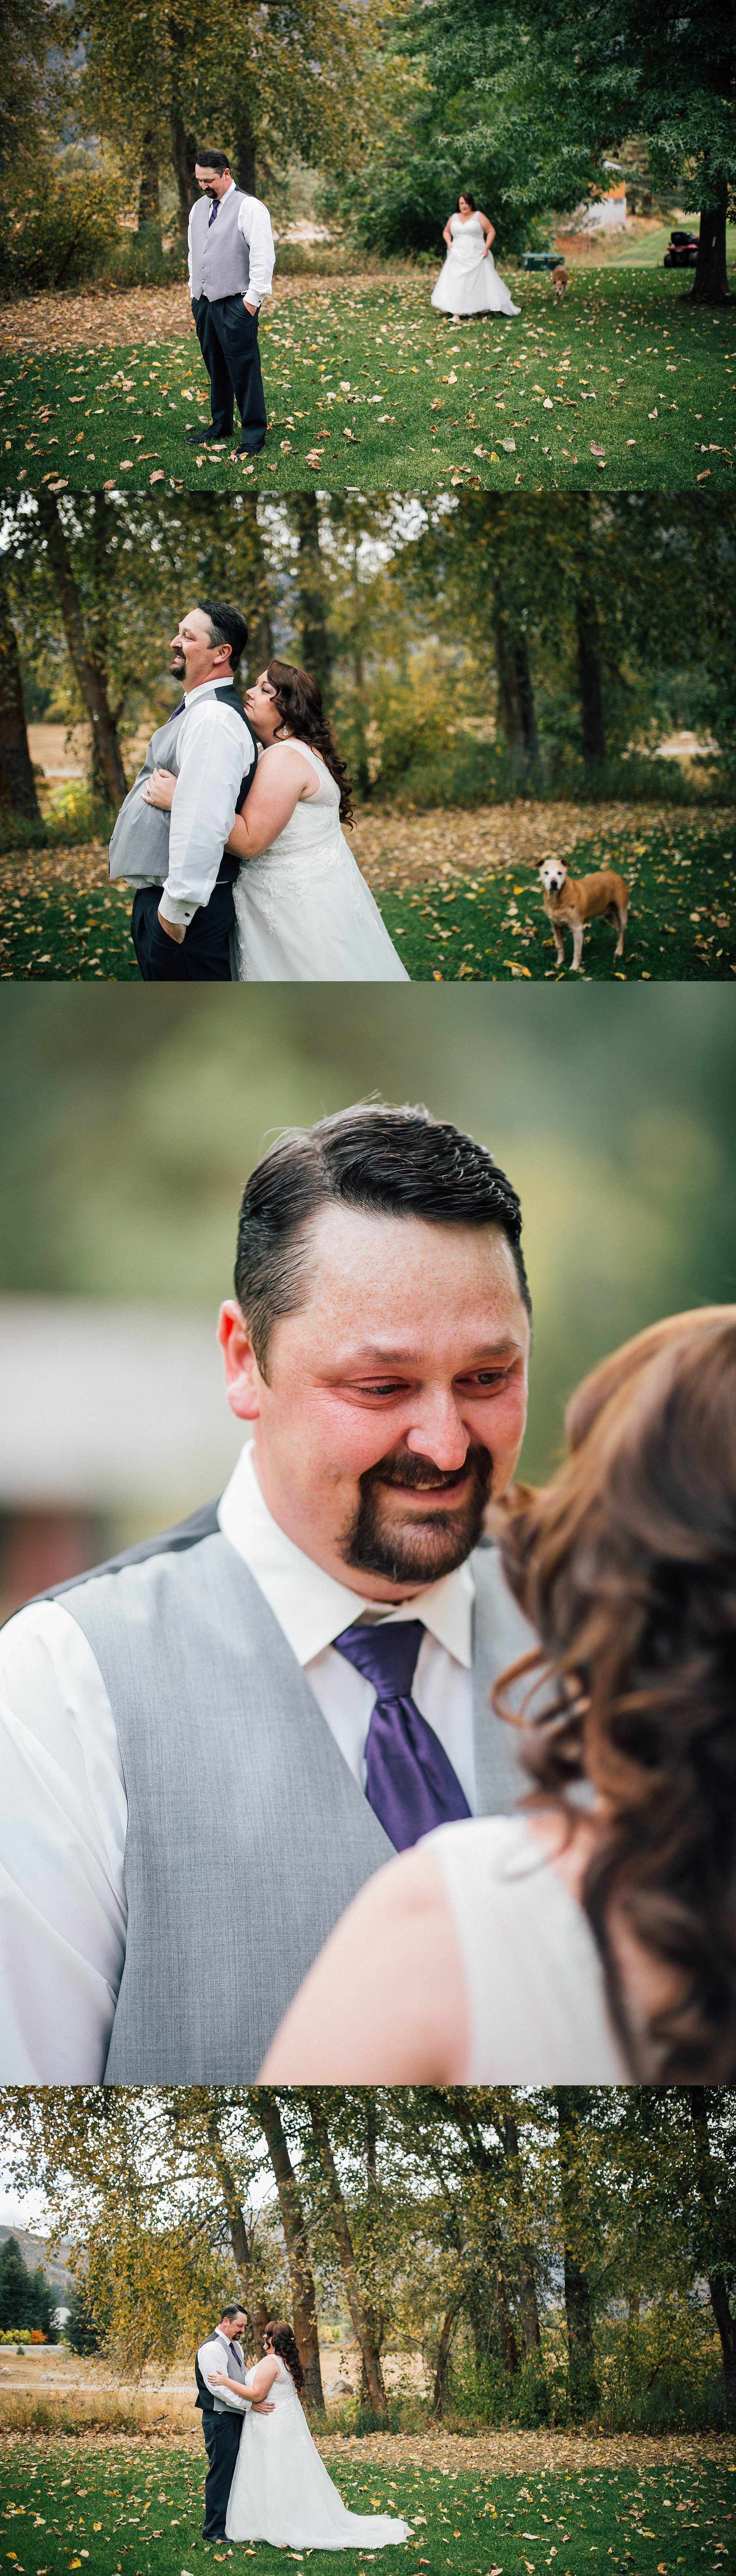 ashley_vos_seattle_ wedding_photographer_0226.jpg